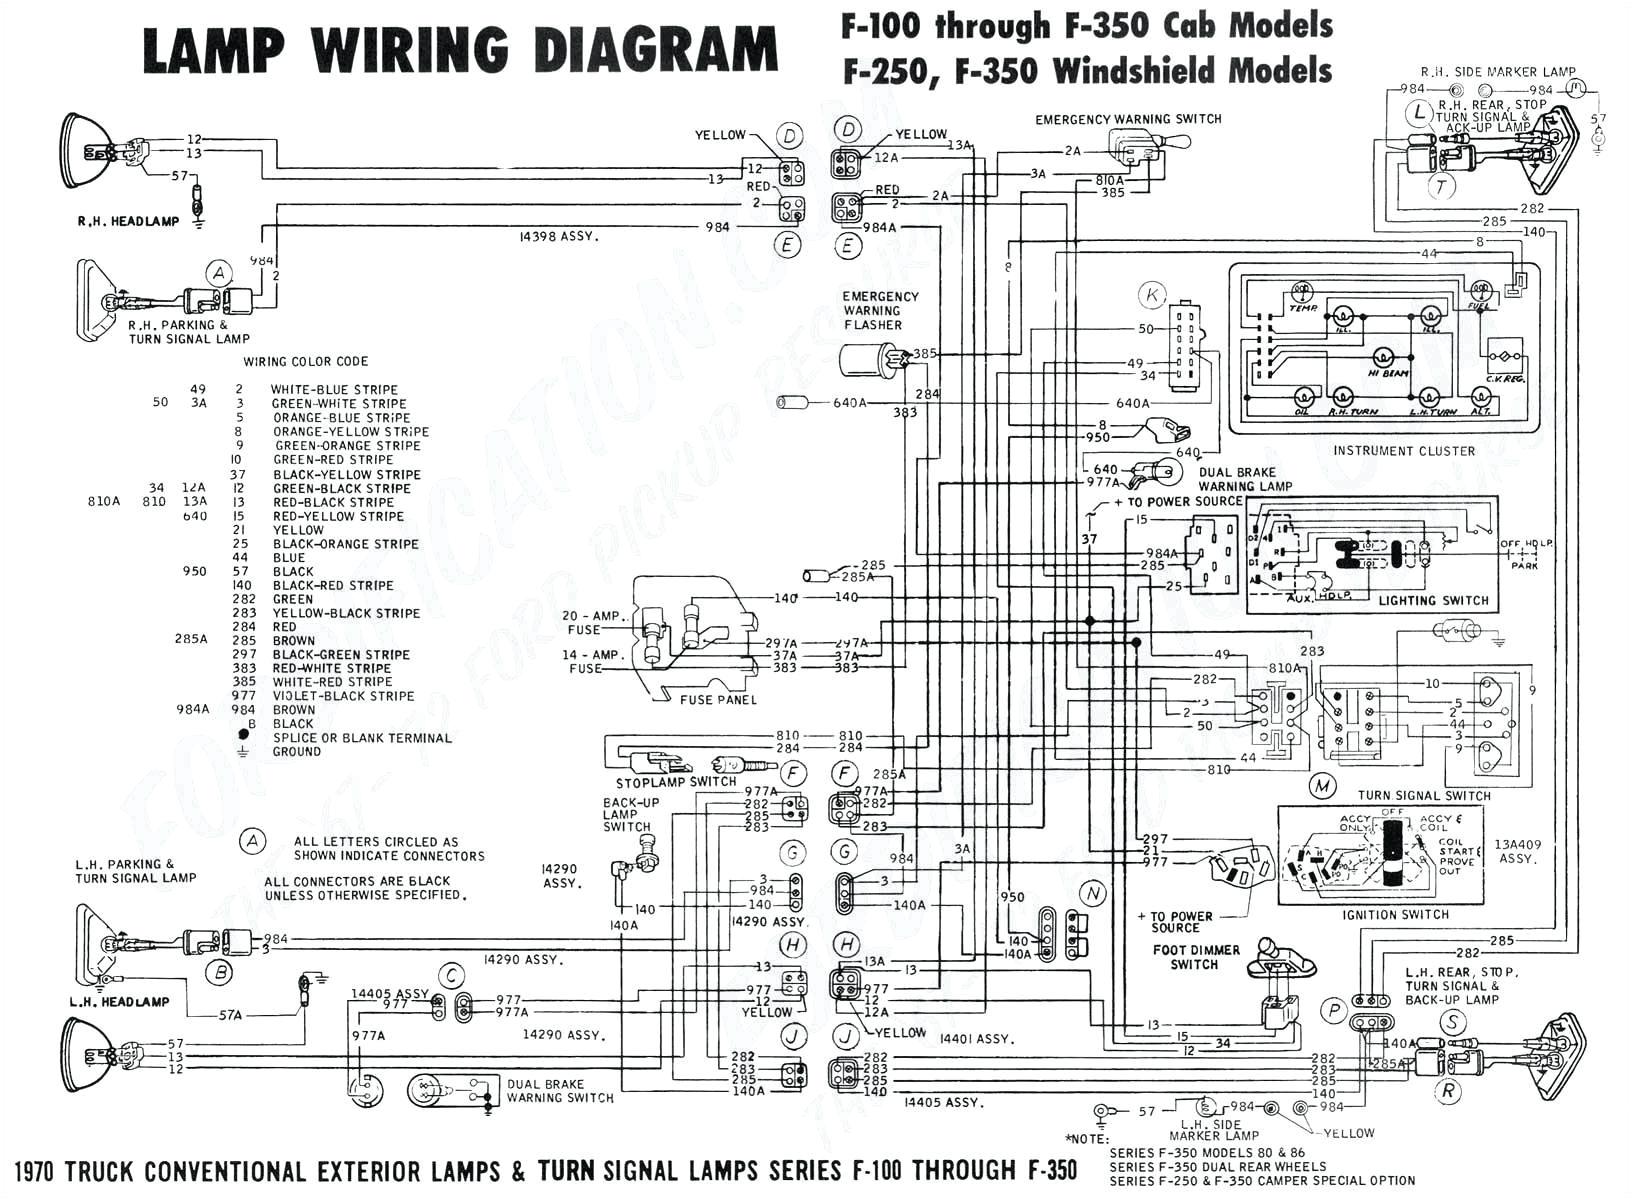 2004 dodge neon a c pressor wiring diagram free picture wiring diagram user